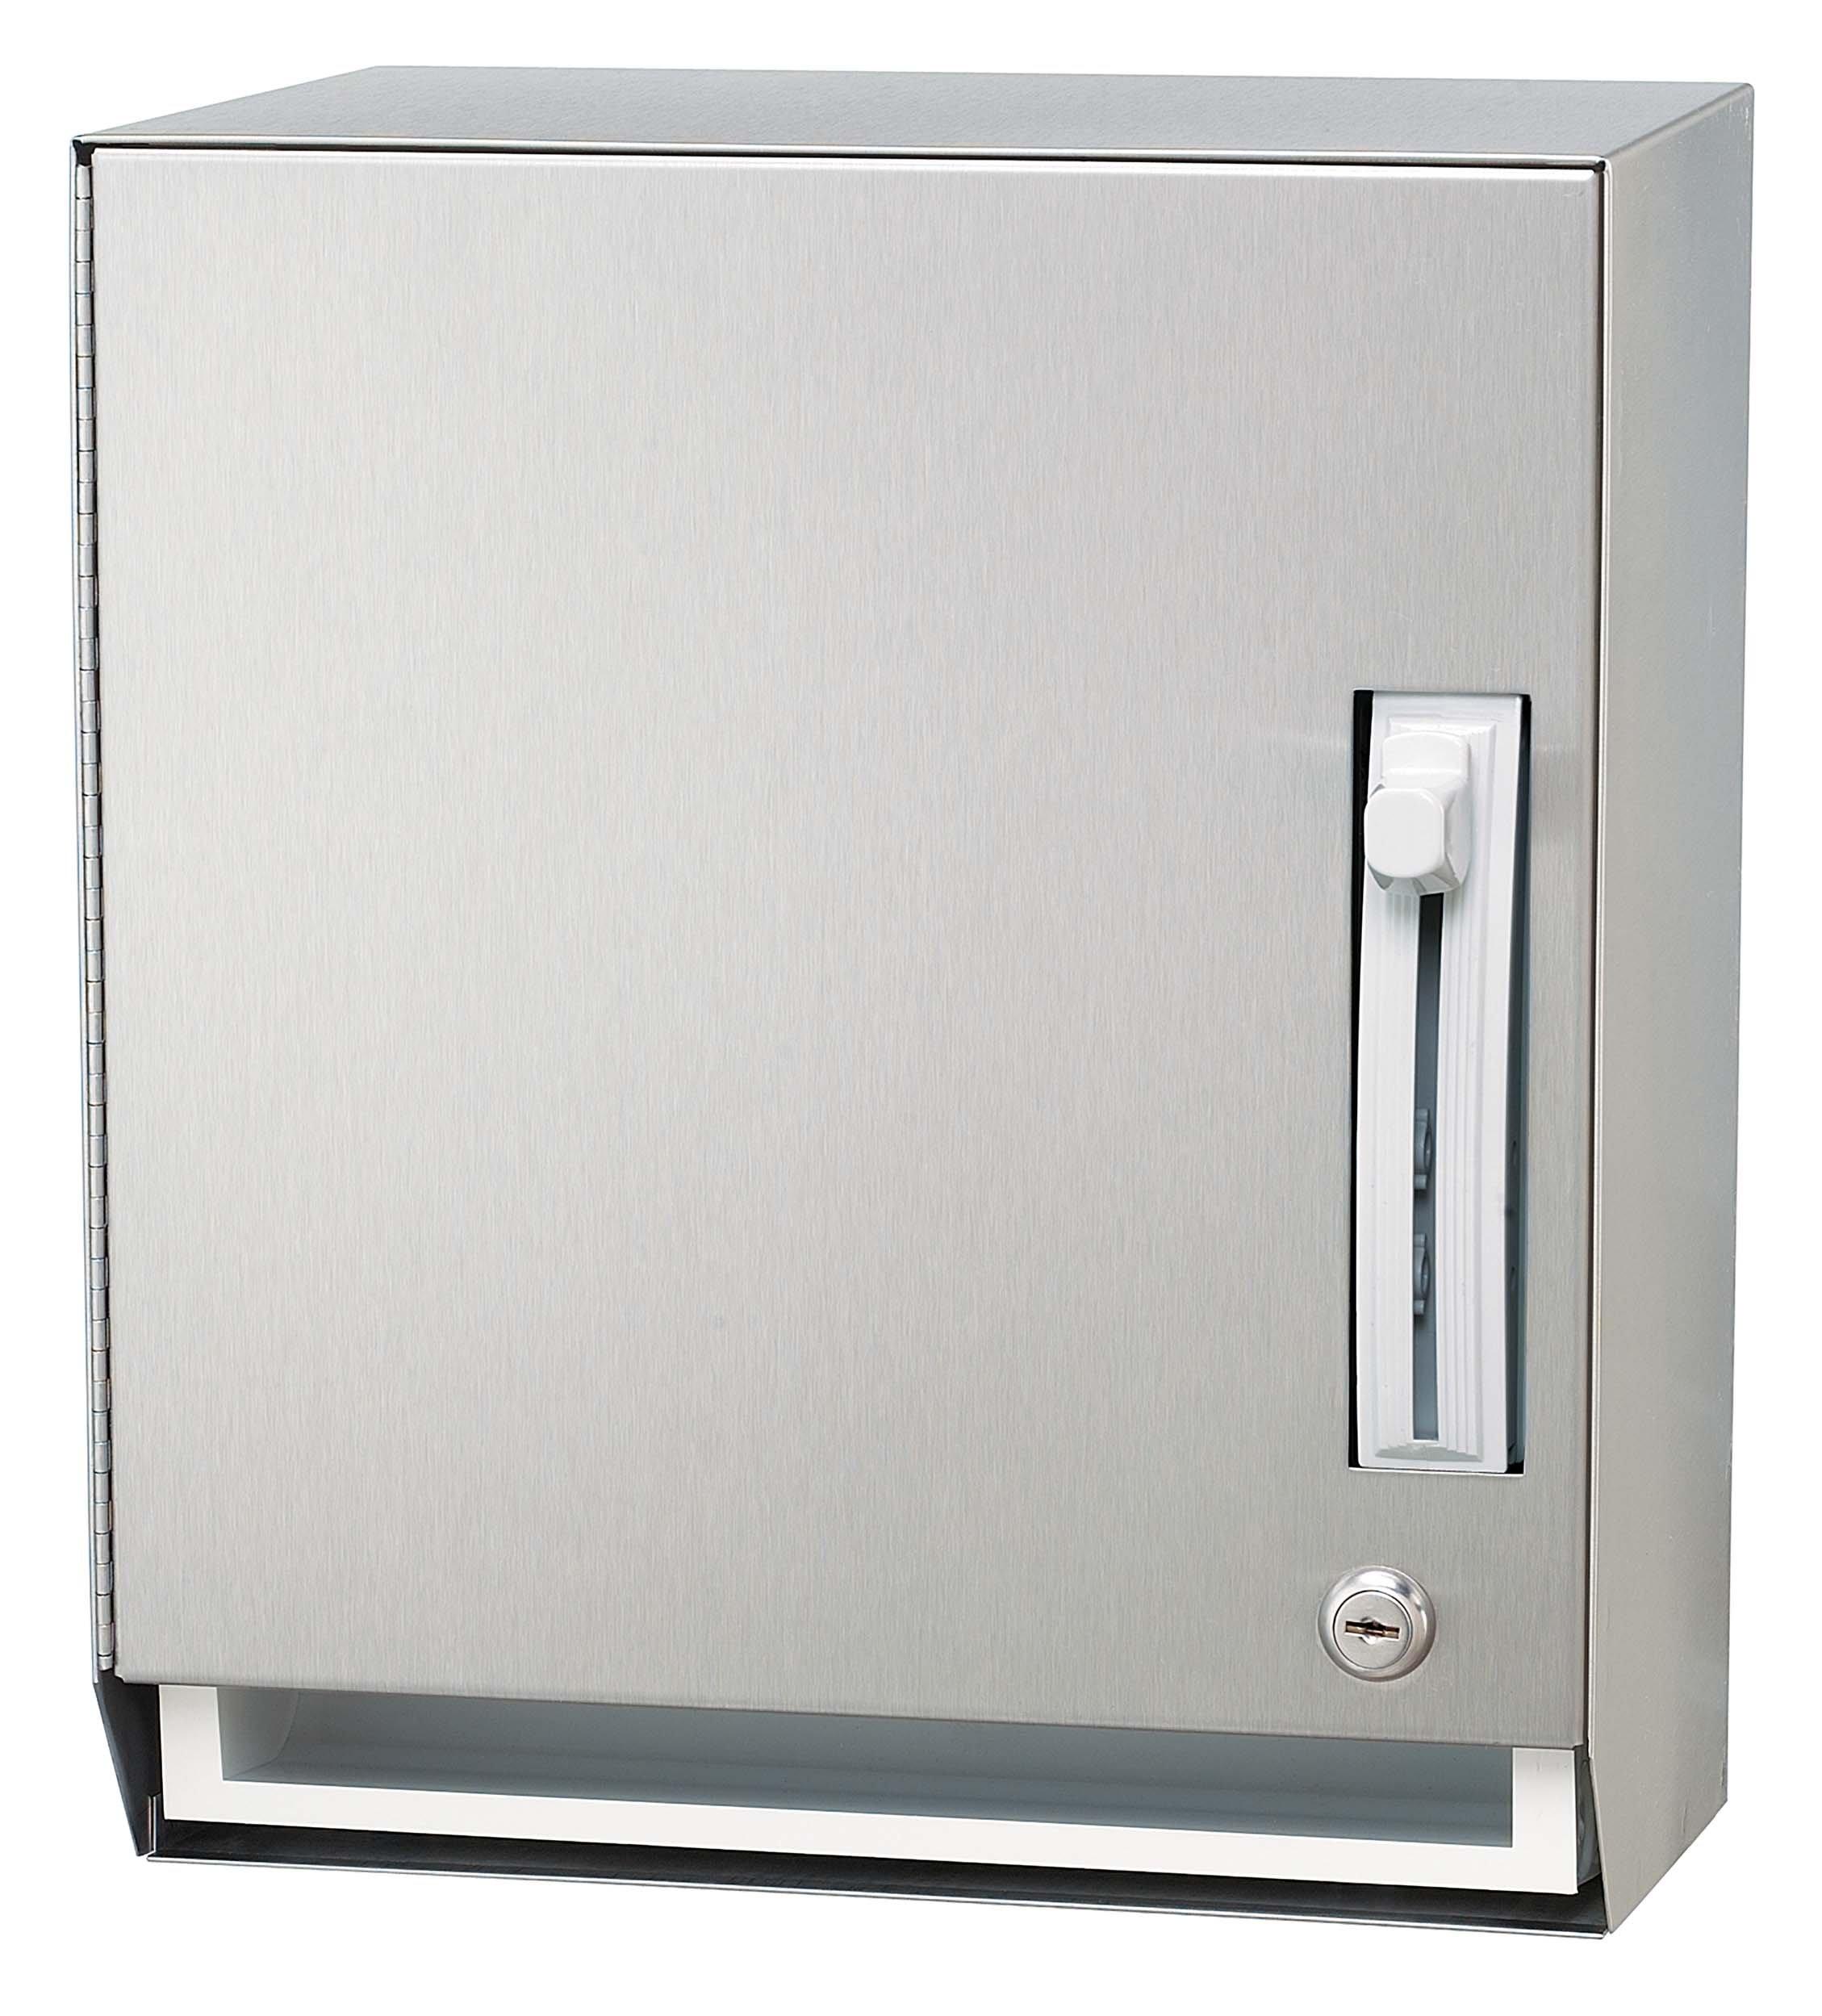 Bradley 2483-000000 Stainless Steel Surface Mounted Towel Dispenser, 12-1/4'' Width x 15'' Height x 10-3/8'' Depth